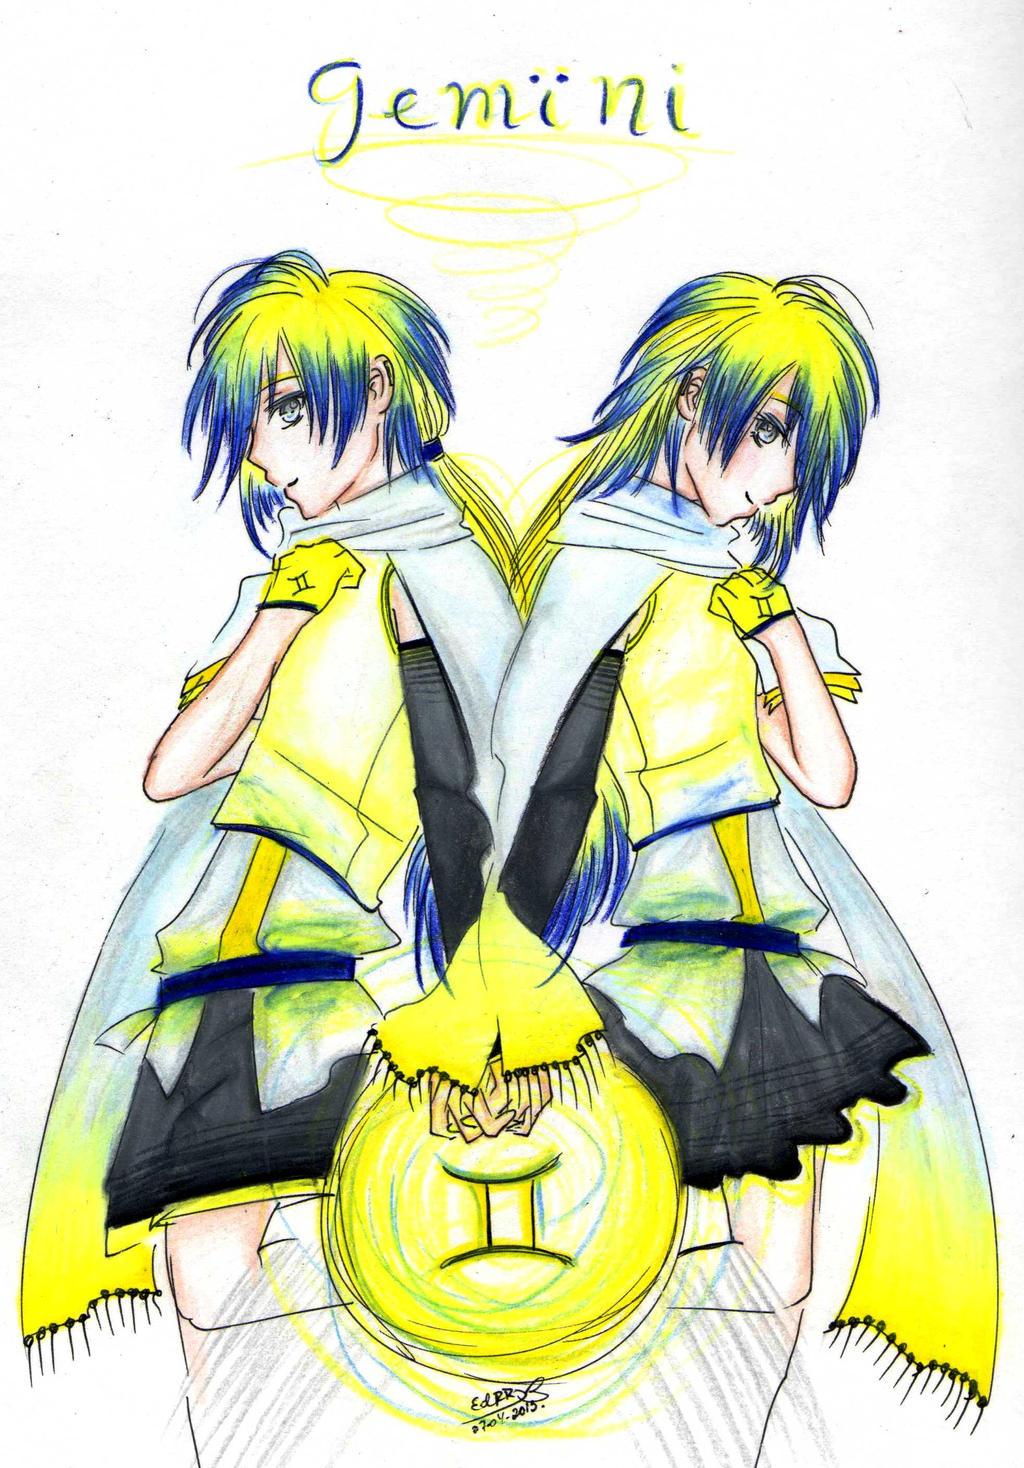 Anime Characters Gemini : Zodiac signs gemini by berichan on deviantart